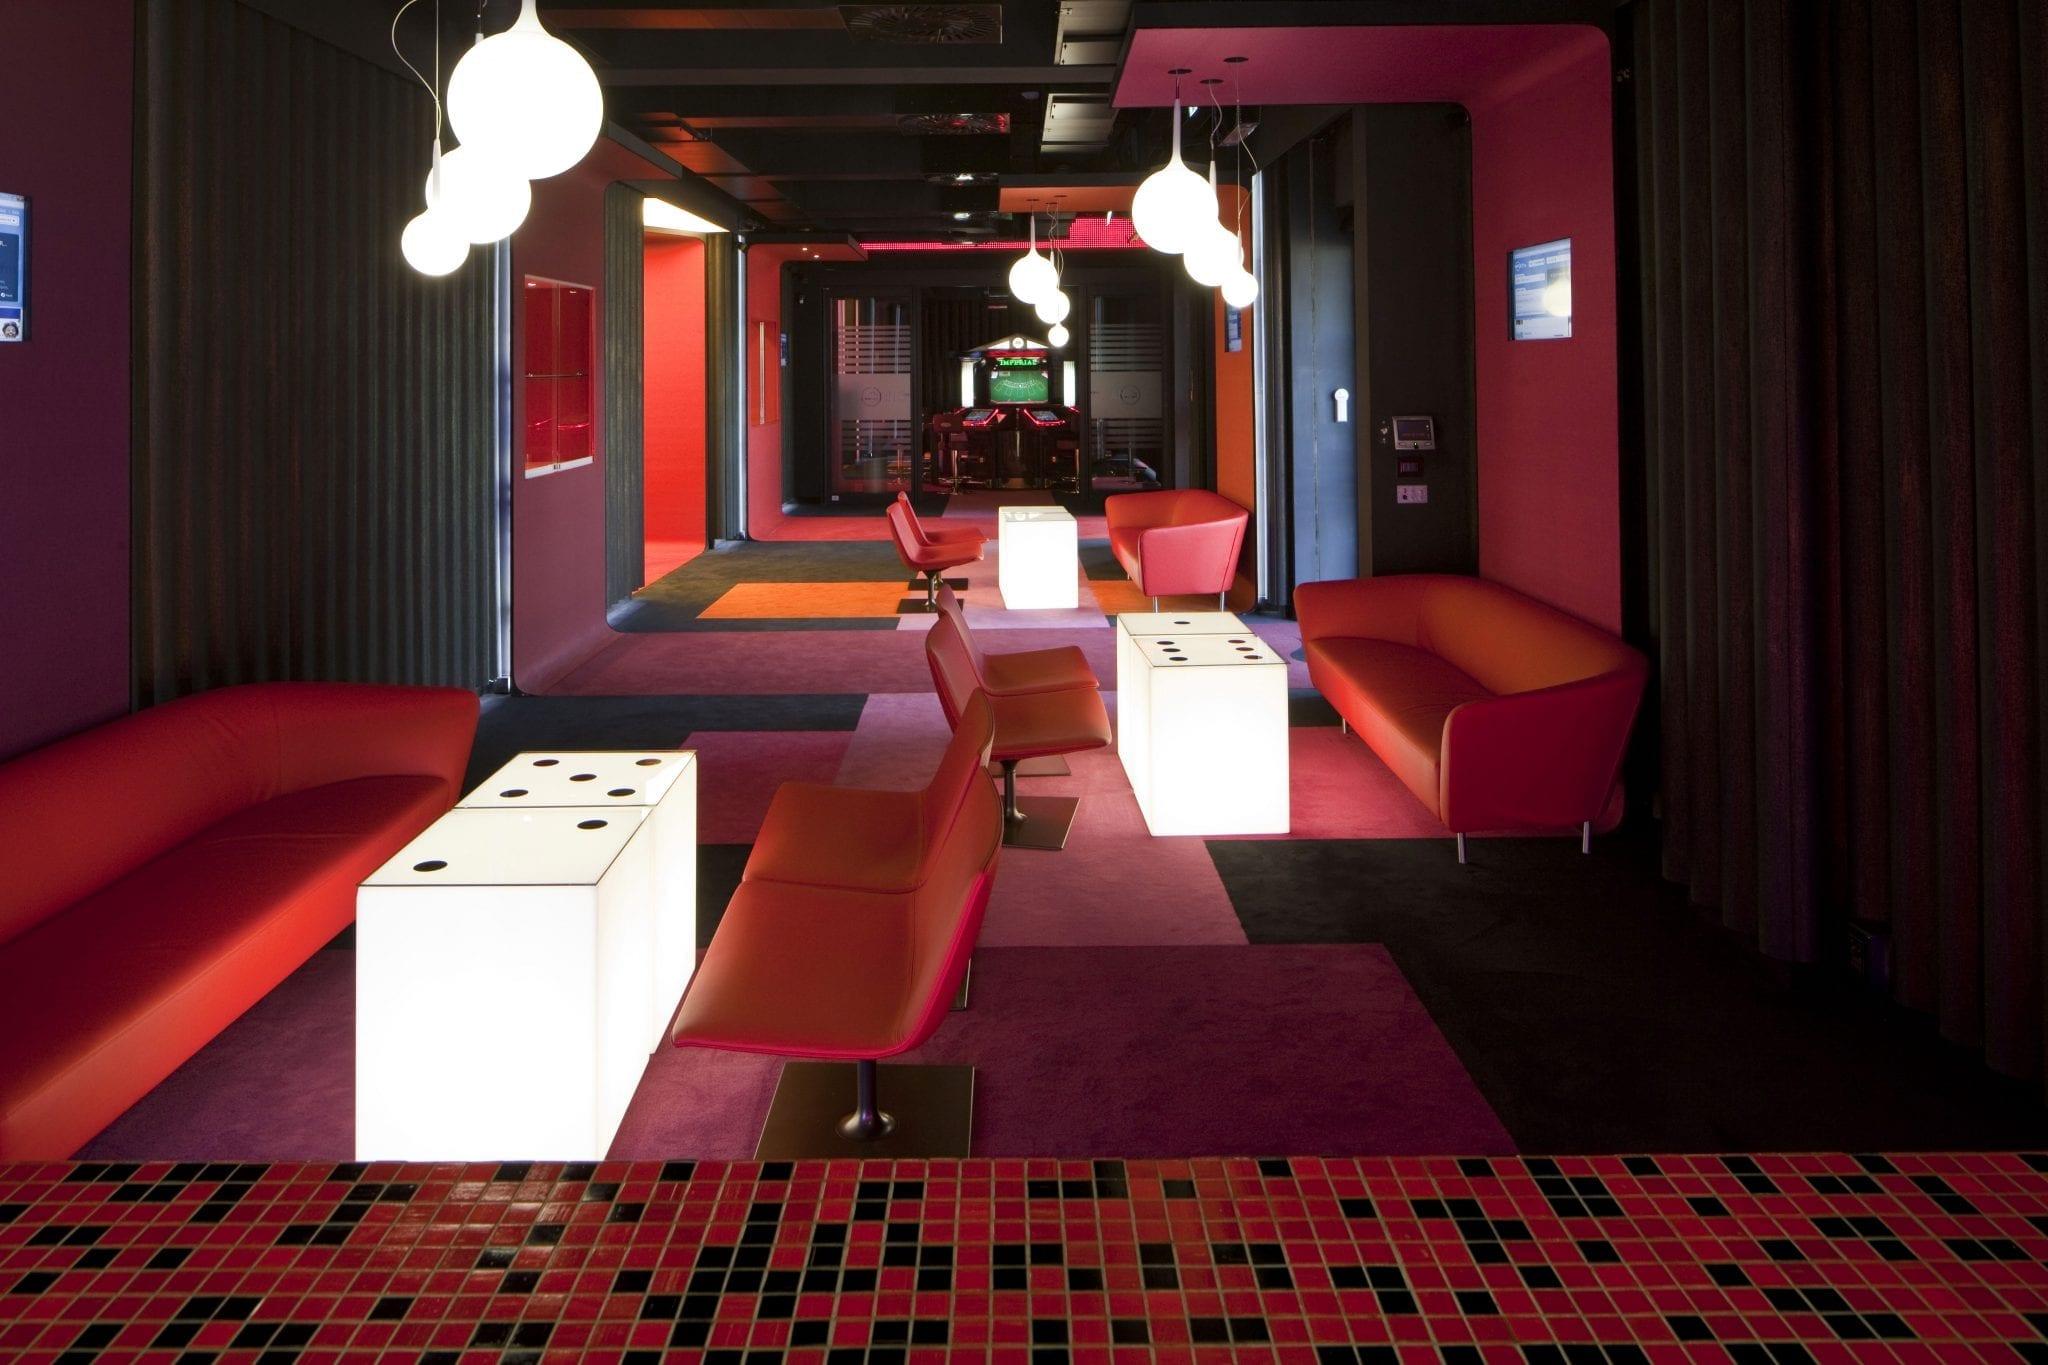 Astoria Gaming Hall, Chioggia, Venice - Italy Slide